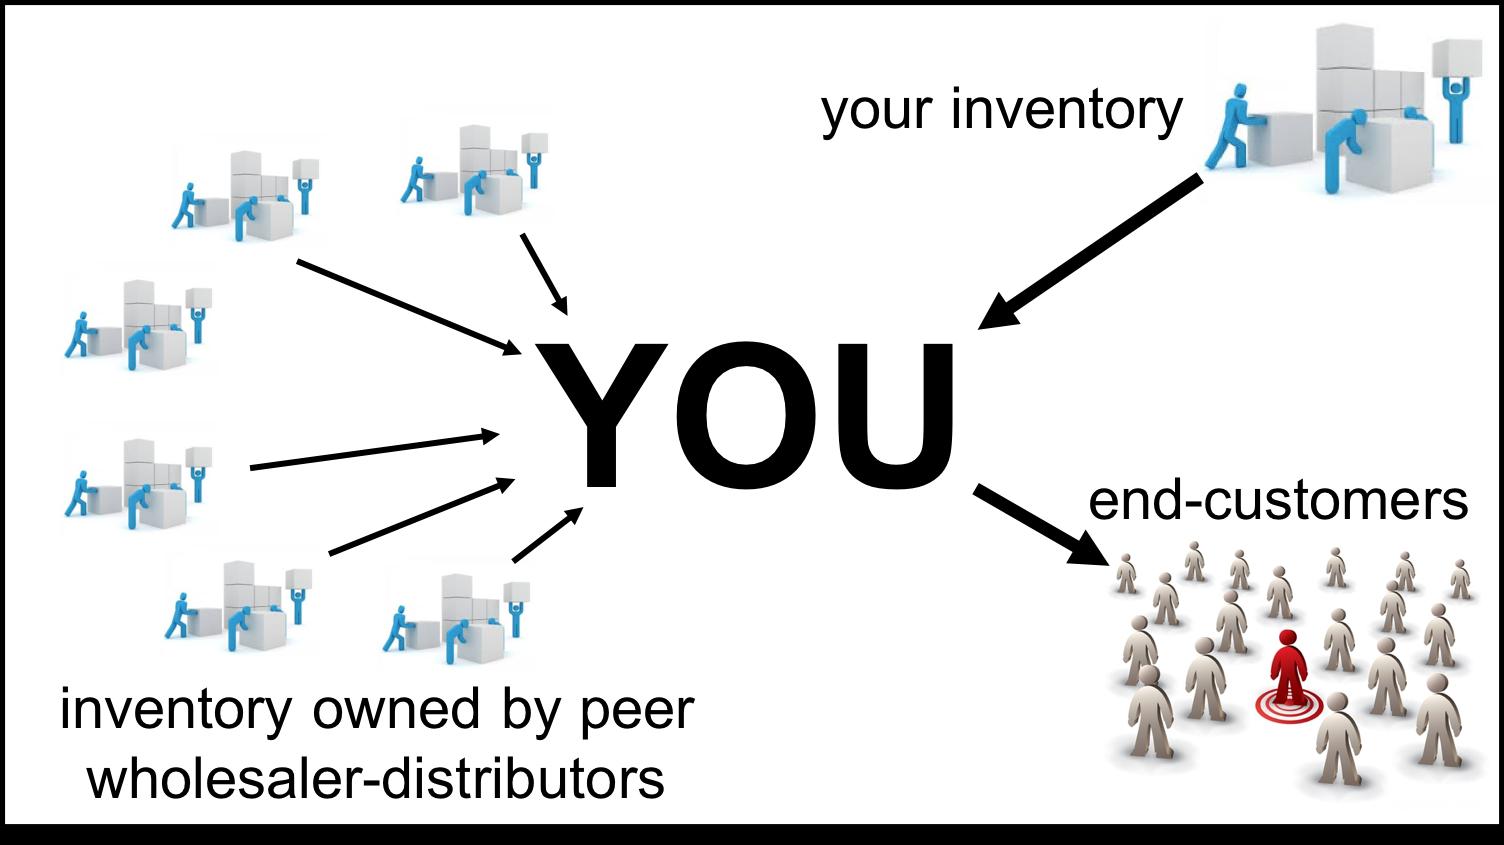 inventory sharing